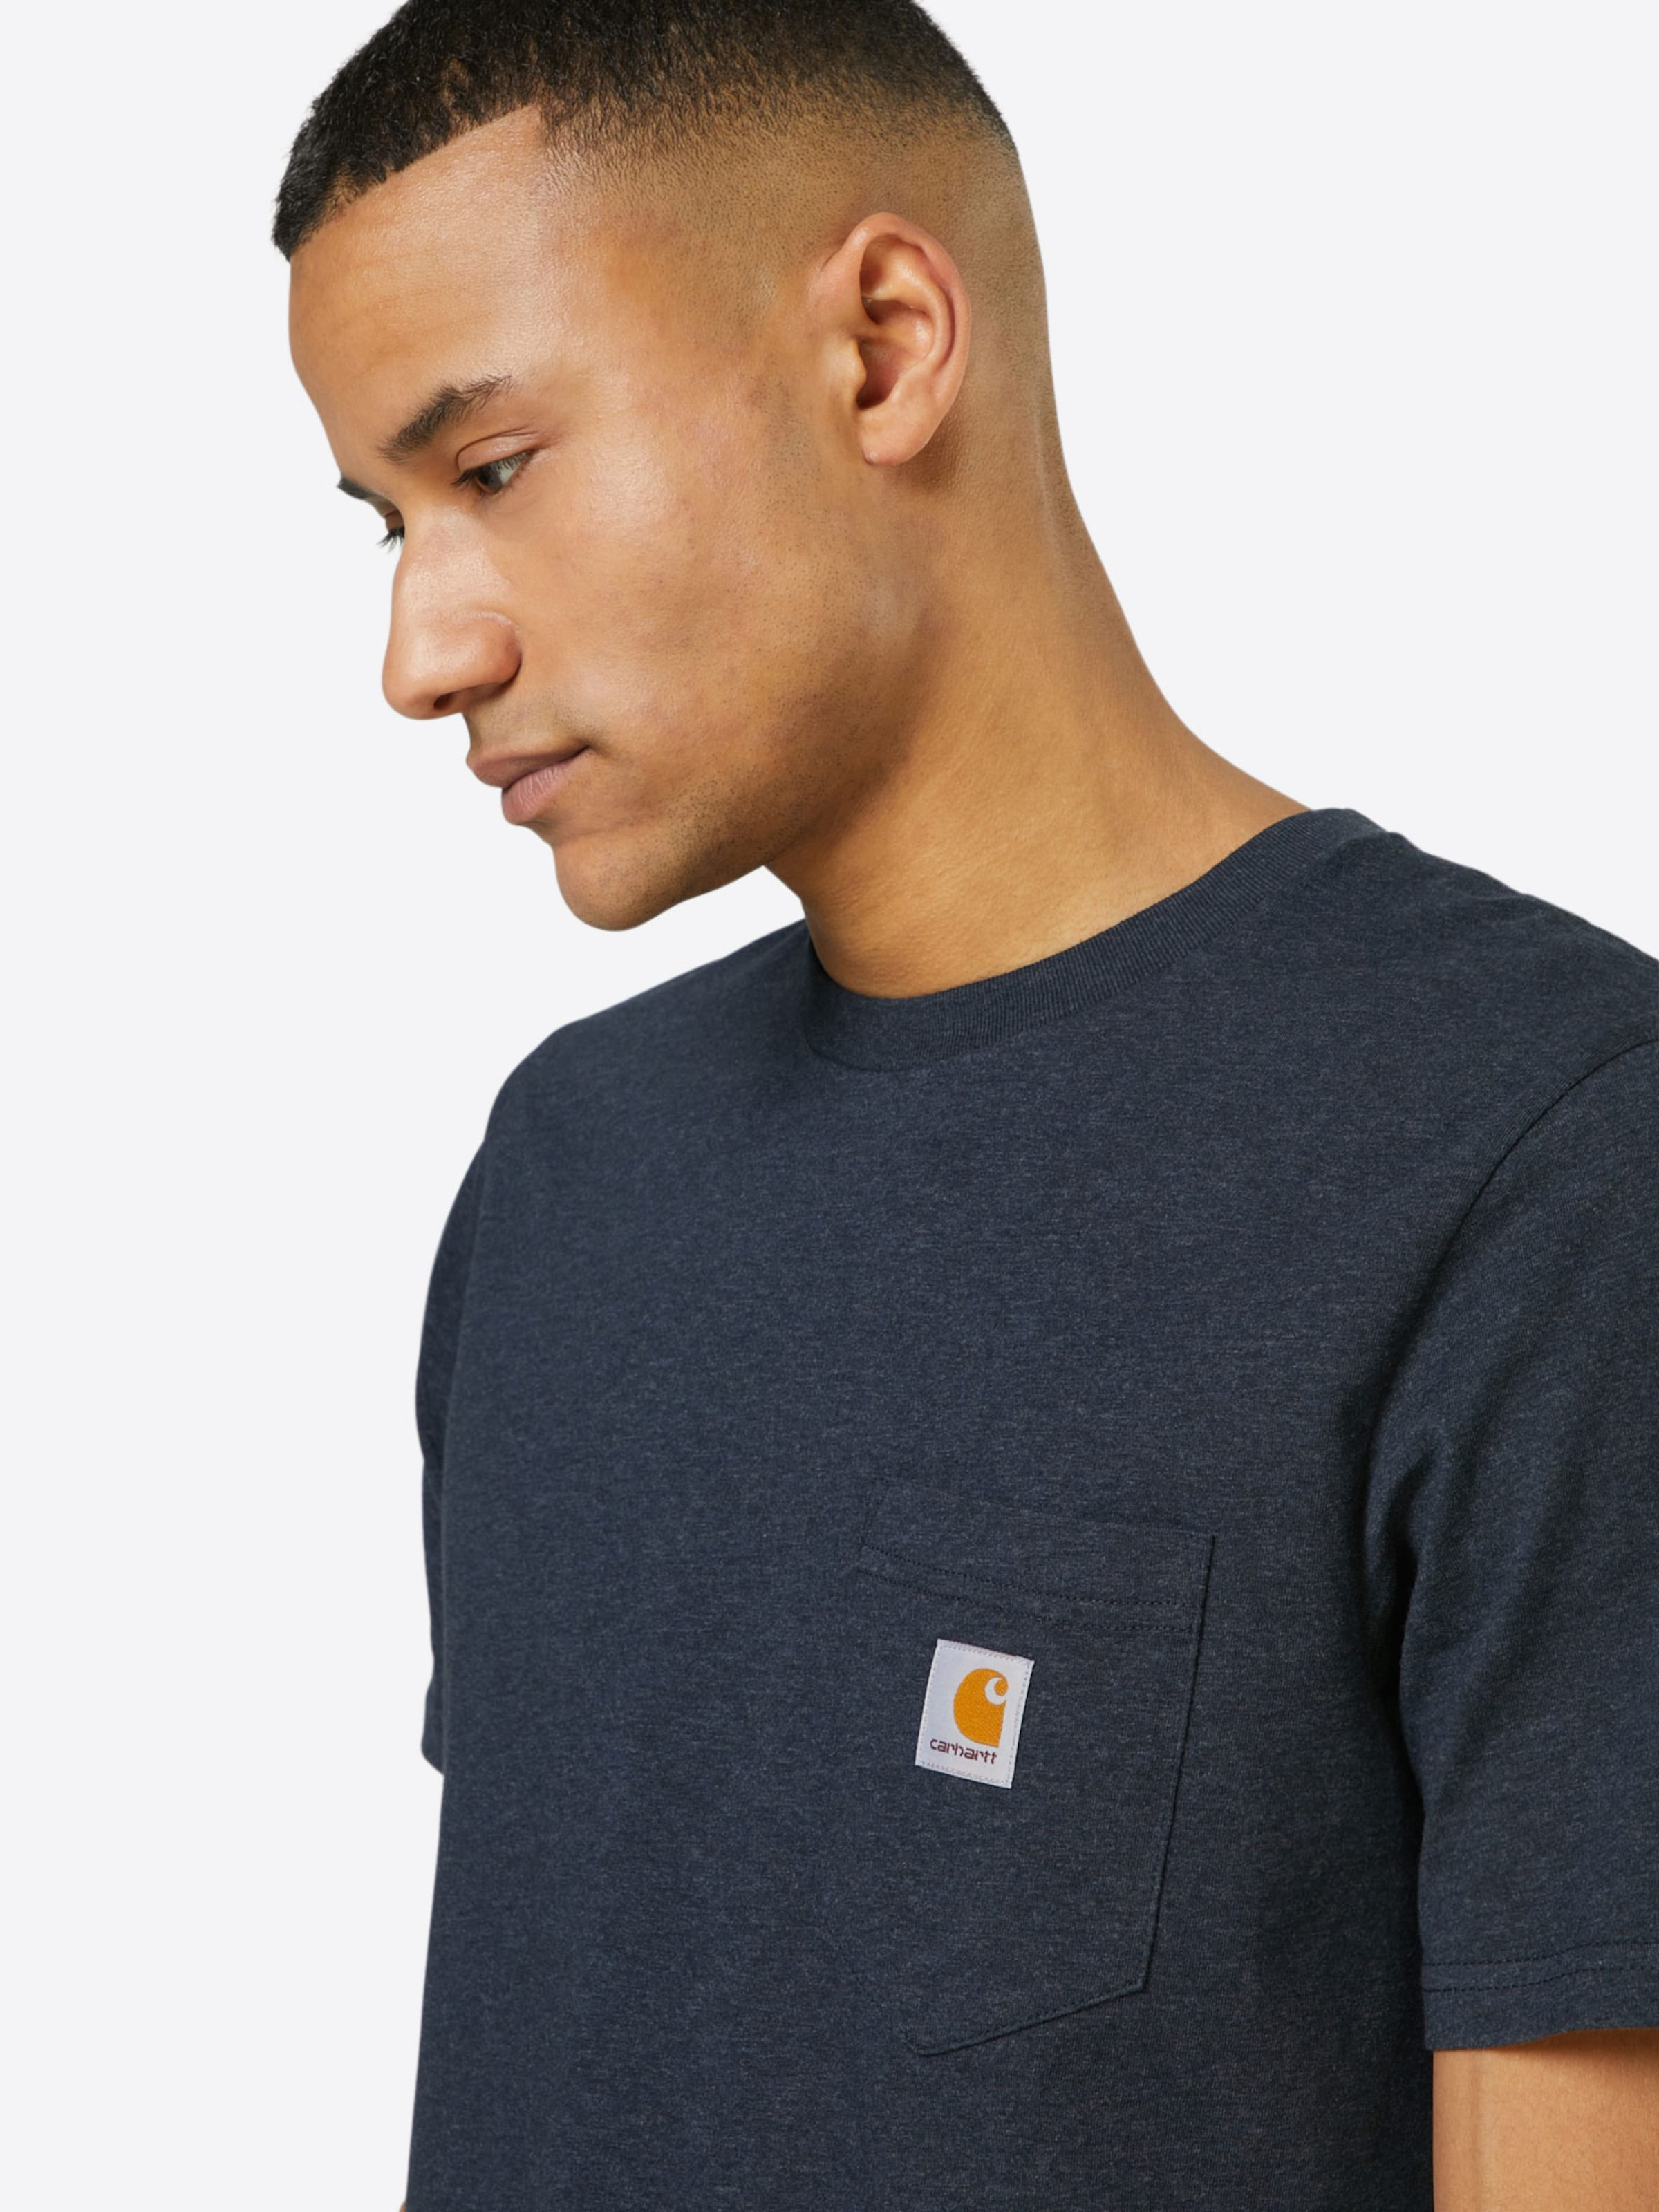 Carhartt WIP T-Shirt Vorbestellung aIAId79t